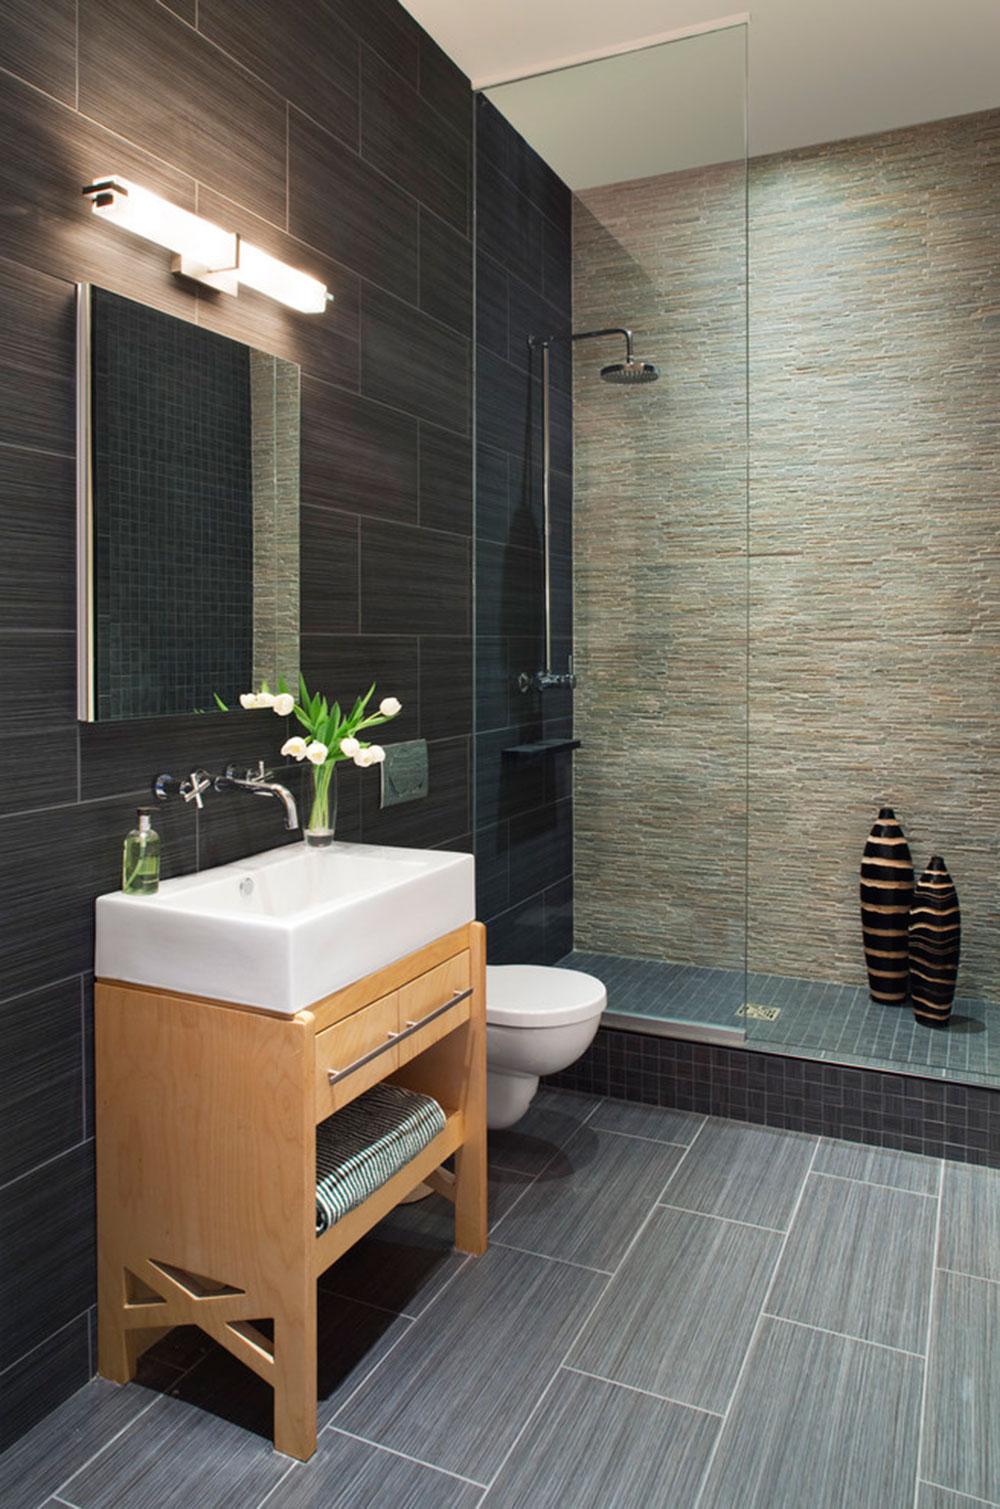 Best lighting for bathrooms2 Best lighting for bathrooms